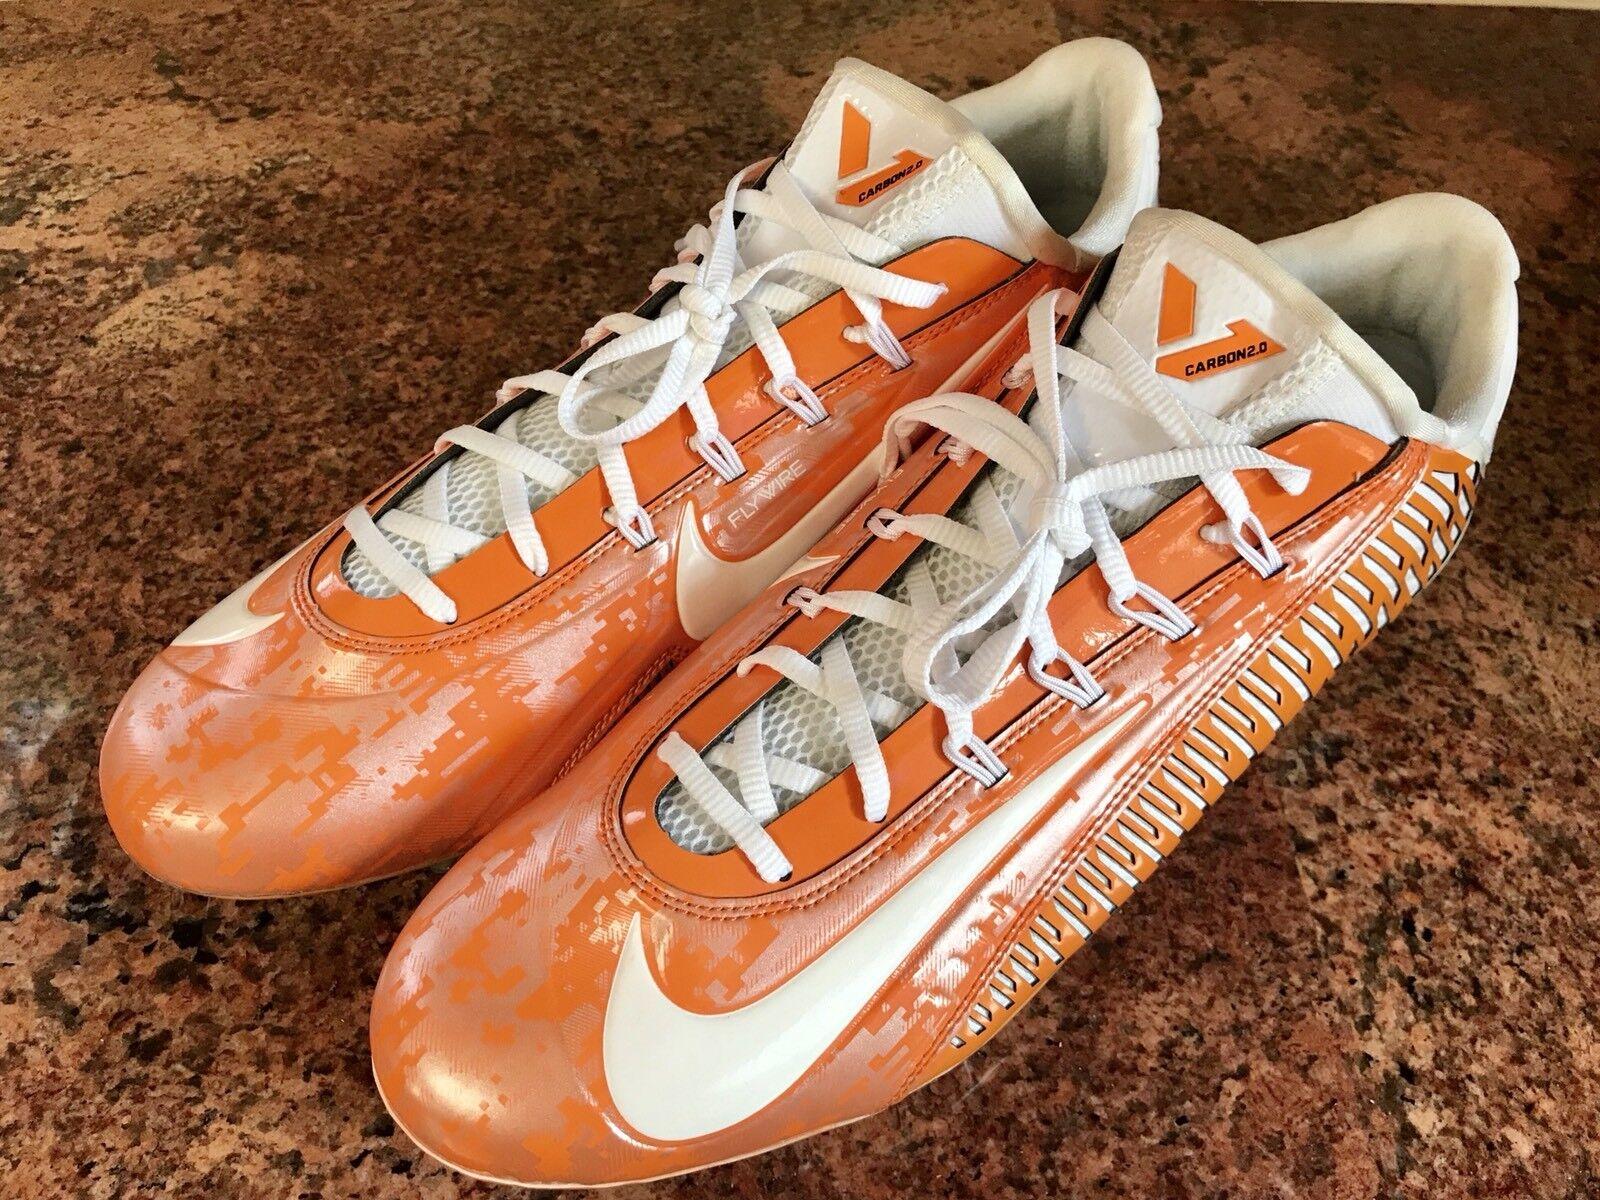 Nike vapore carbonio nikeid football elite scarpe arancione / bianco Uomo sz